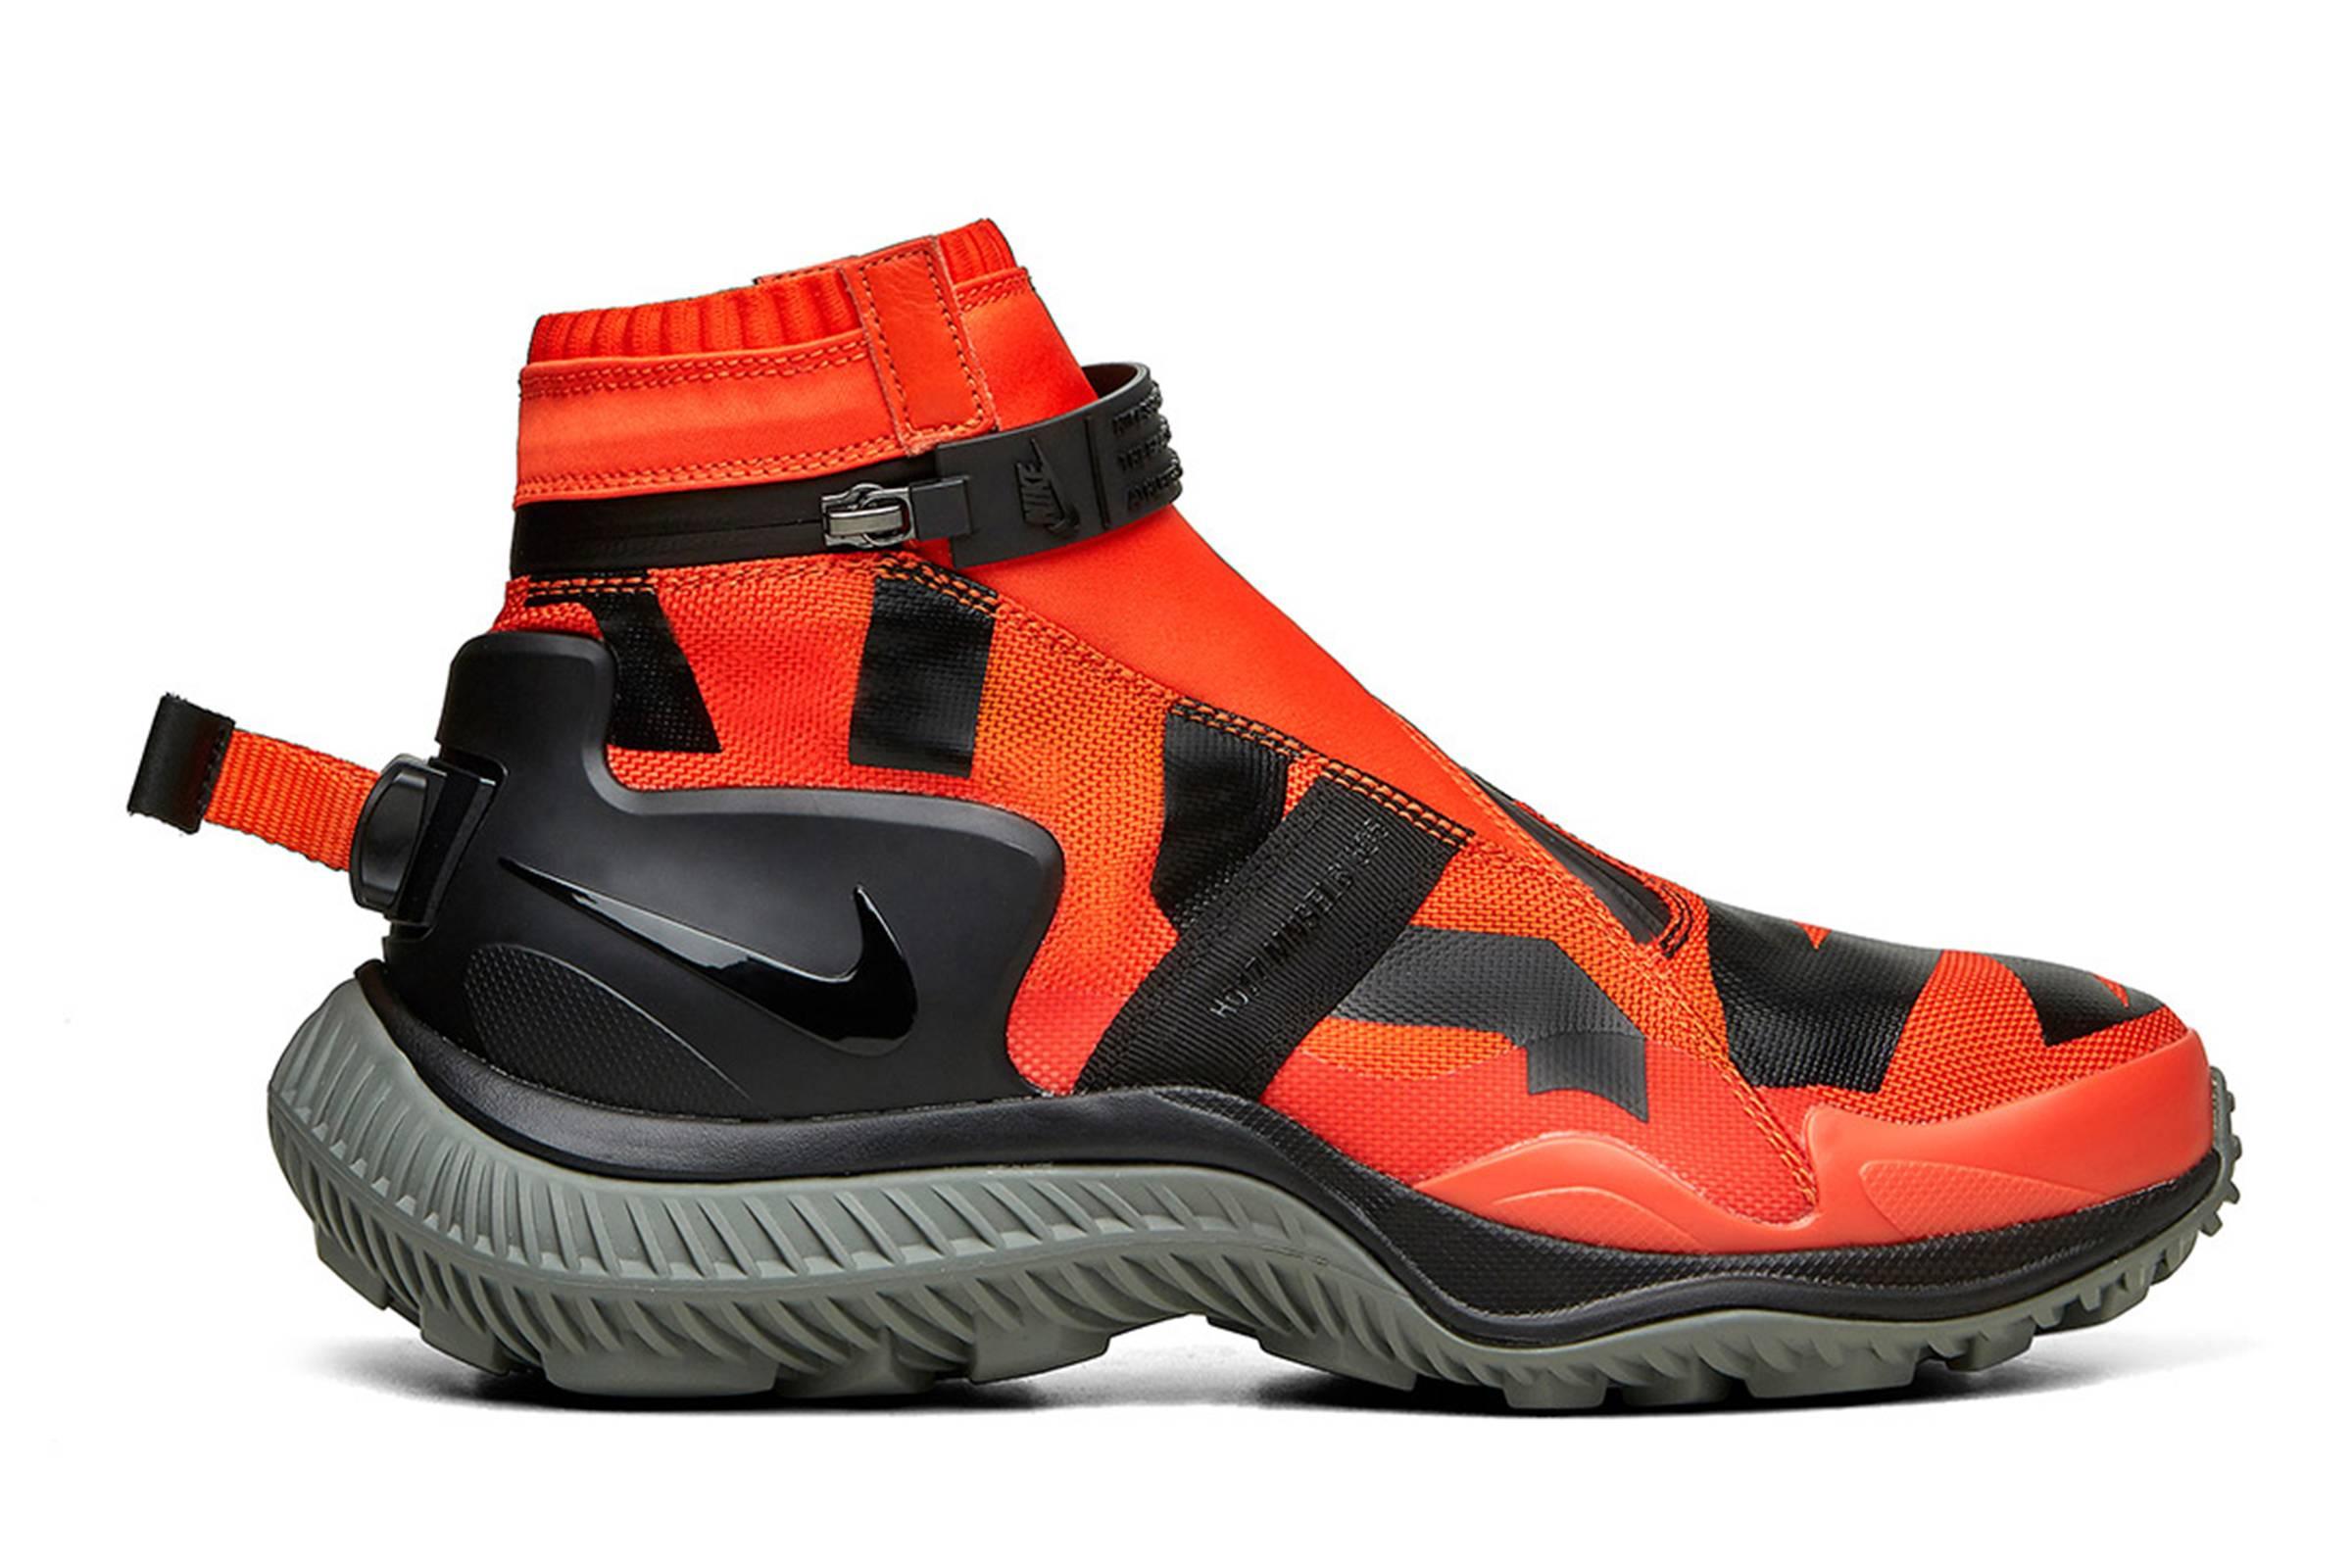 Nike Gyakusou Gaiter Boot